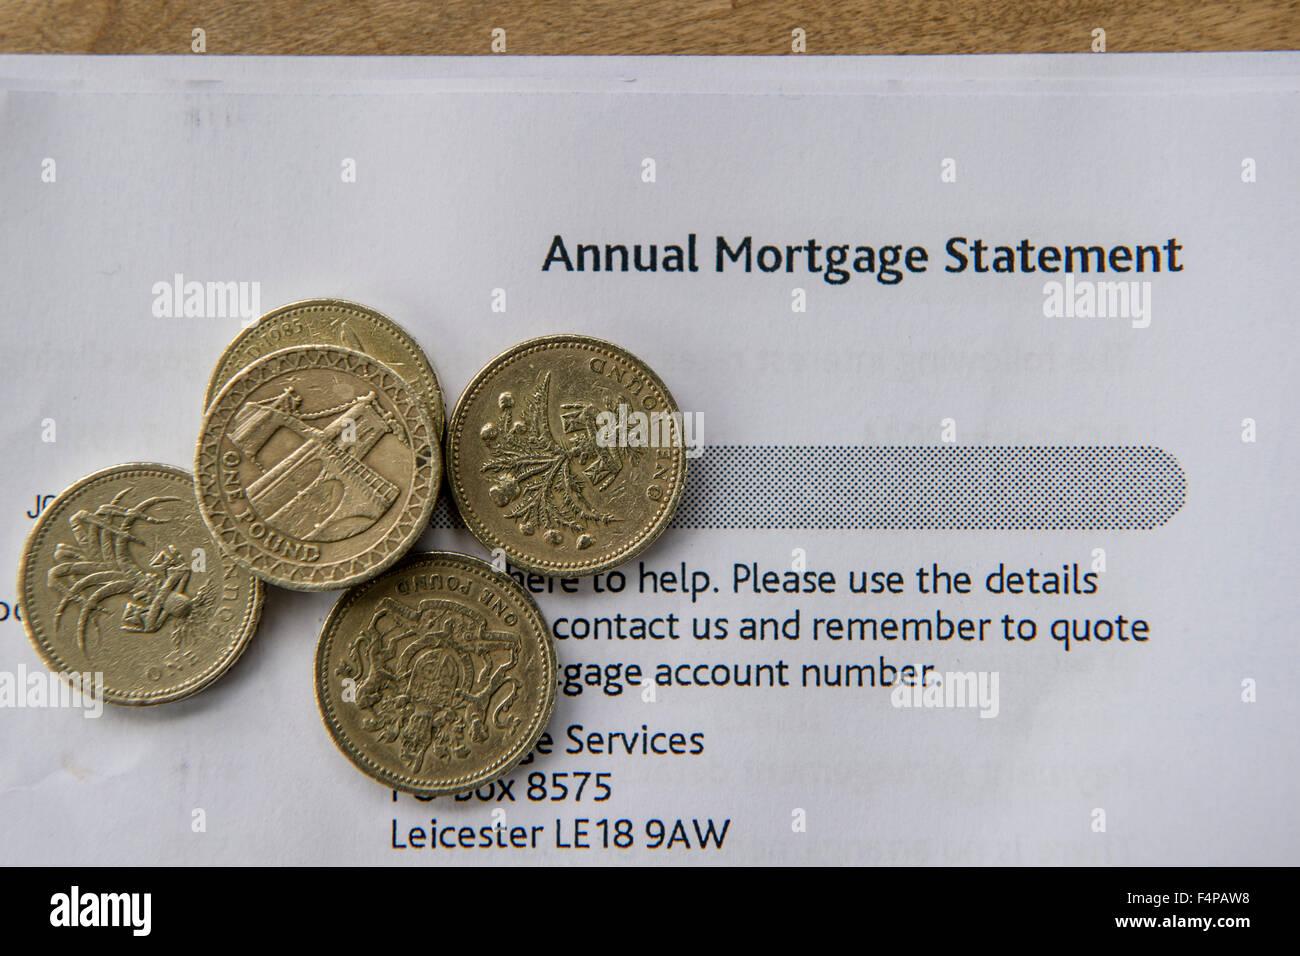 Mortgage statement - Stock Image